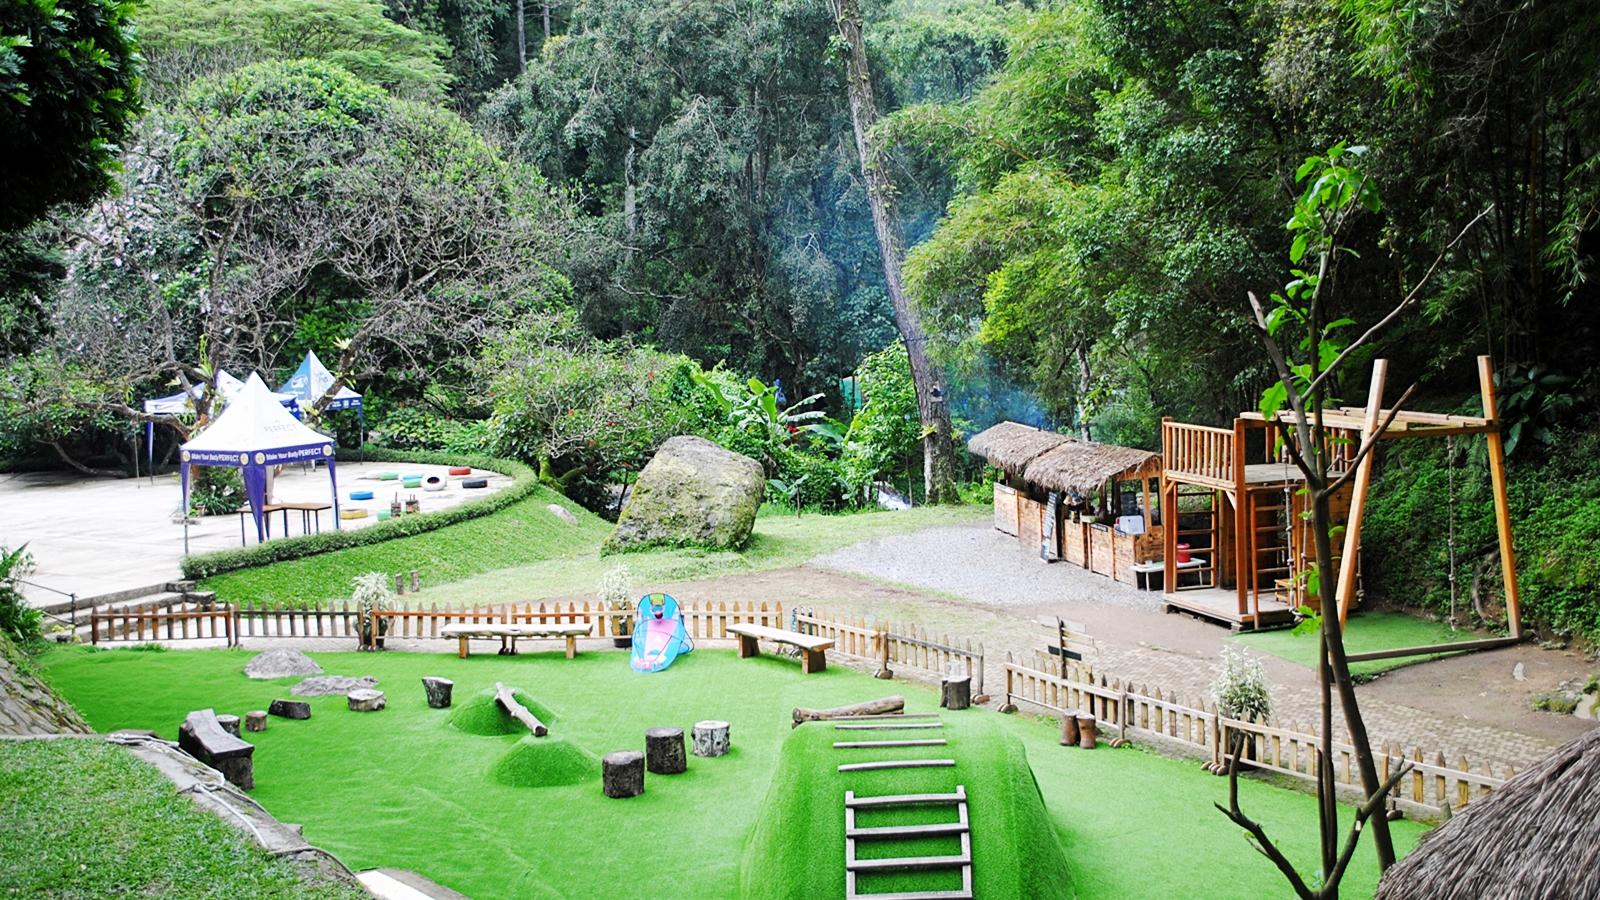 6 Tempat Wisata Keluarga di Bandung yang Asyik - Tour Bandung